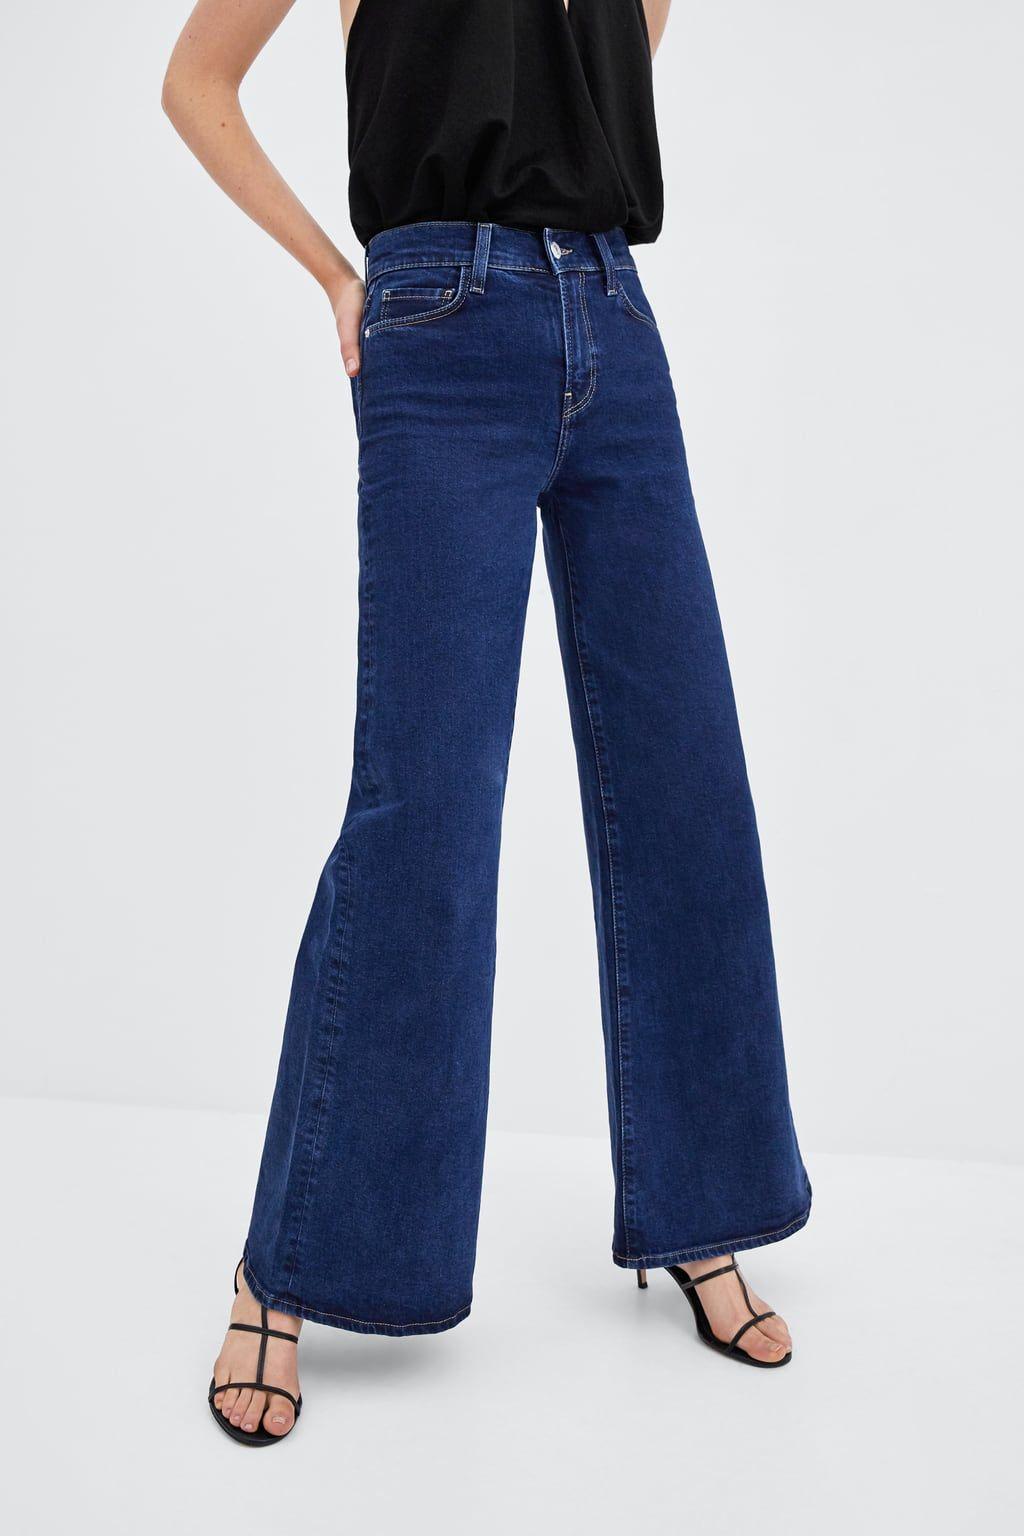 migliori scarpe da ginnastica 7fb73 44fc6 Image 4 of HI-RISE PALAZZO JEANS from Zara   Flare jeans, Jeans ...